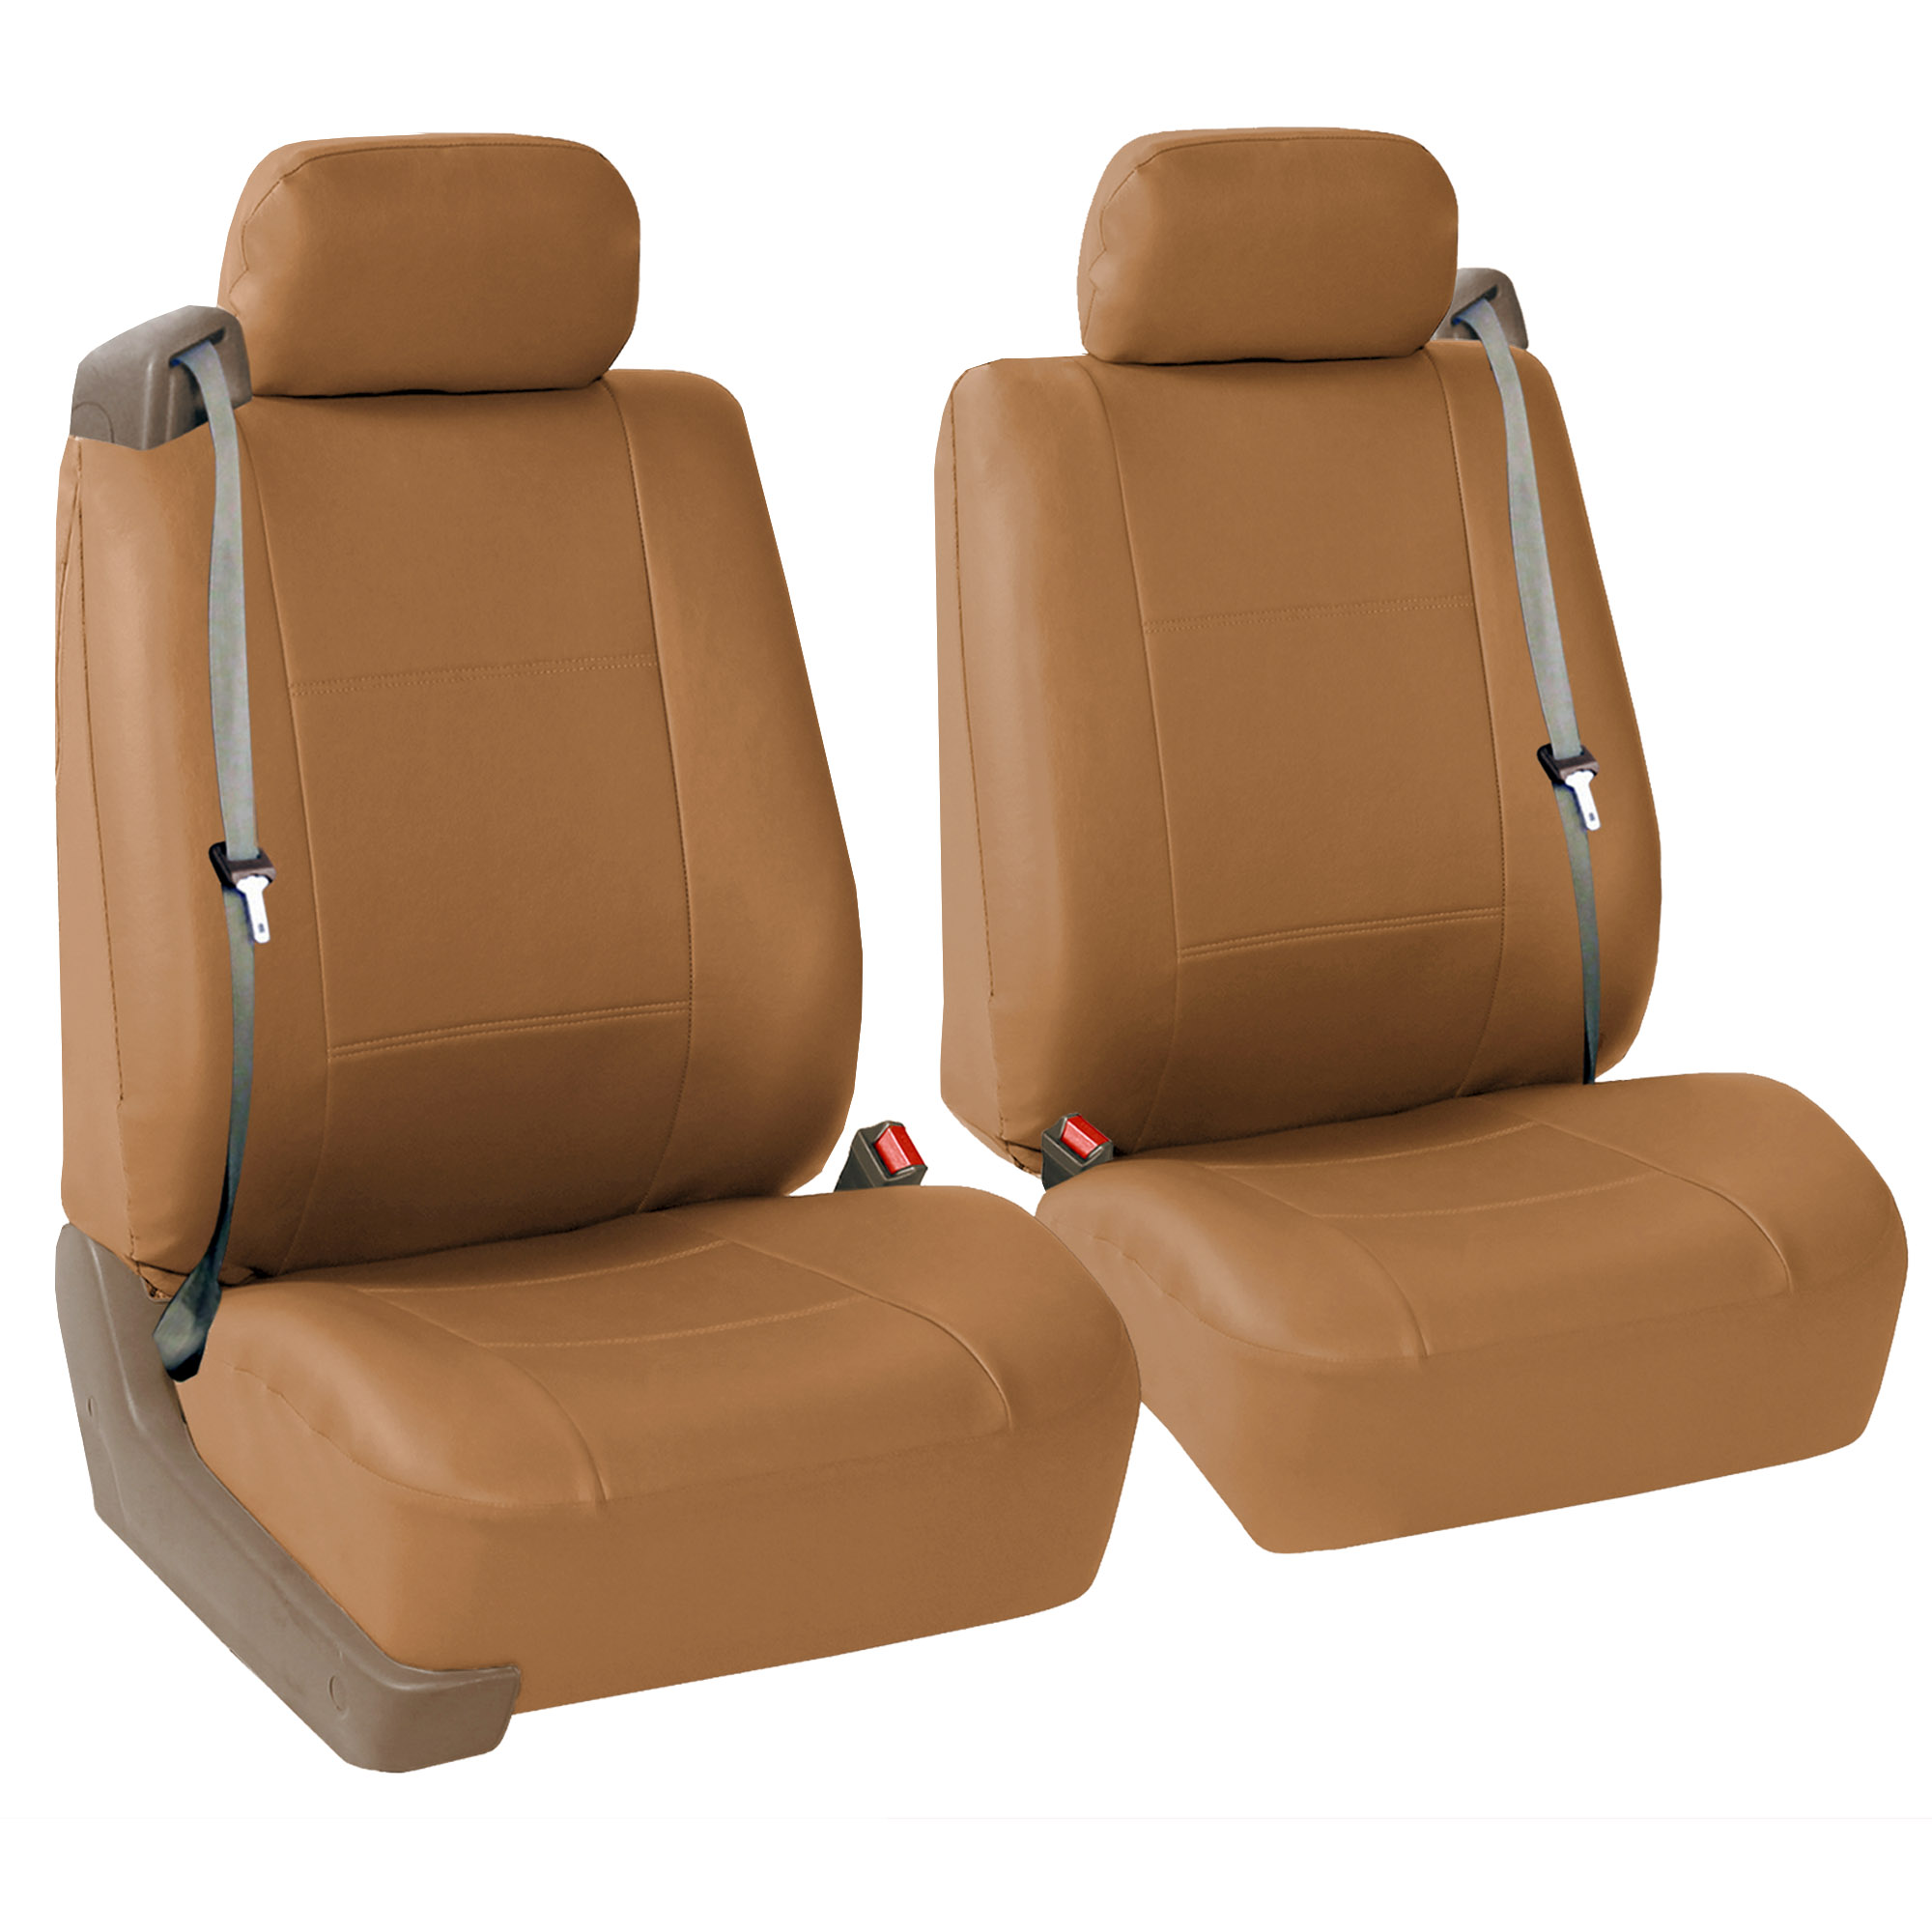 built in seat belt auto seat covers w beige floor mats suv van sedan truck ebay. Black Bedroom Furniture Sets. Home Design Ideas